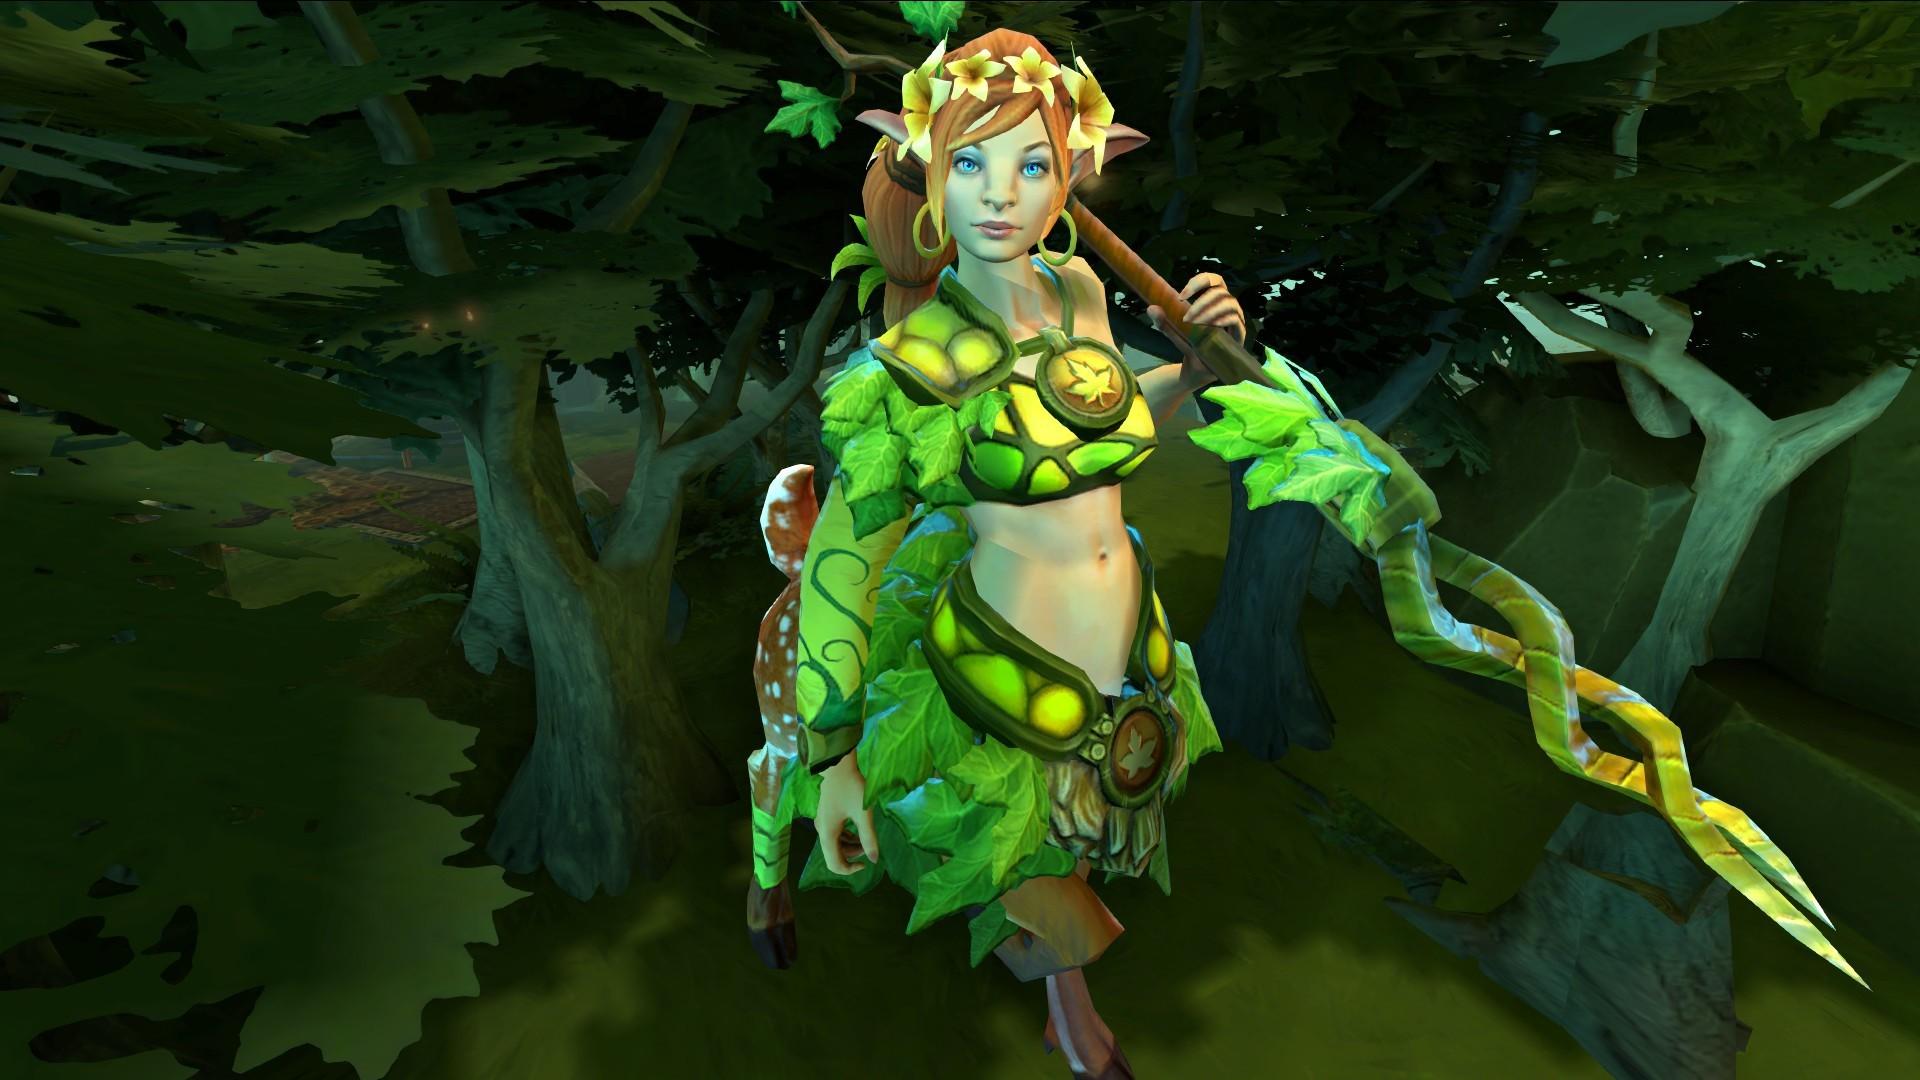 Enchantress Dota 2 Counter